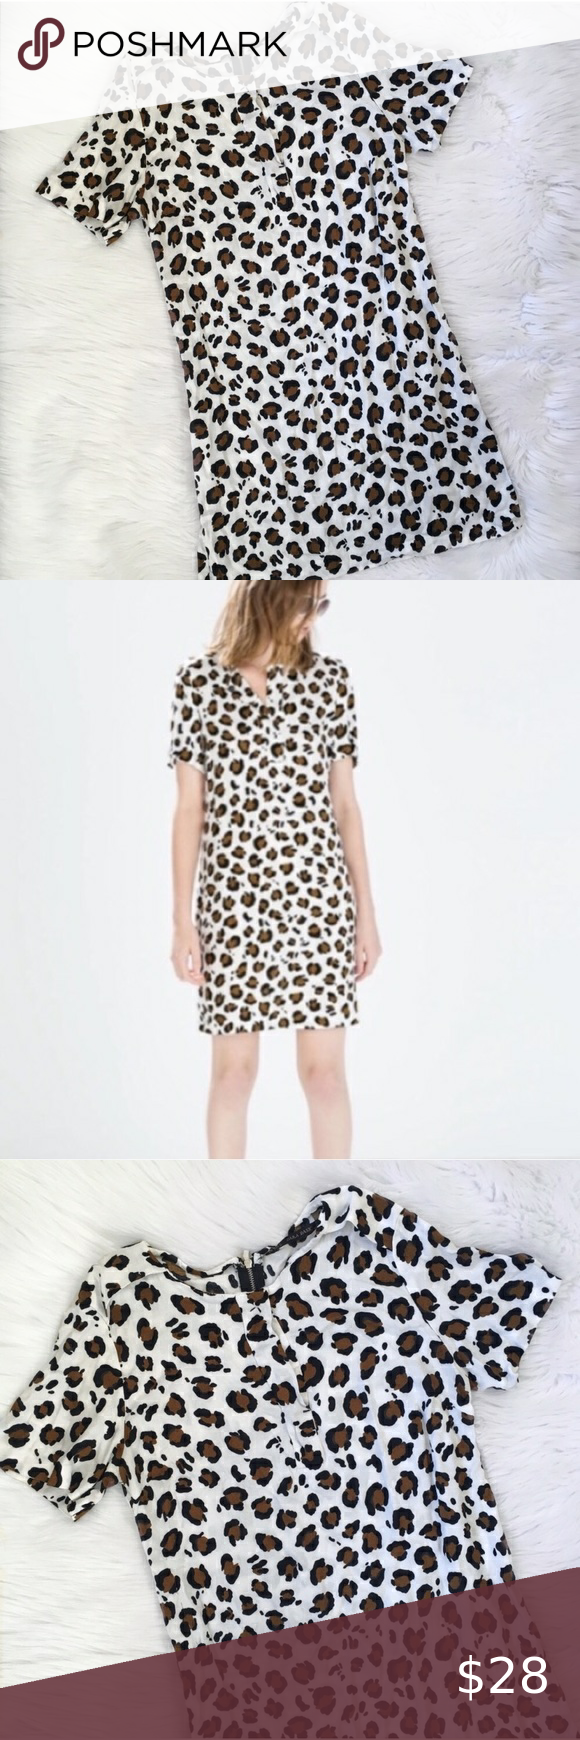 Zara White Cheetah Print Casual Shift Dress Printed Shift Dress Shift Dress Casual Shift Dress [ 1740 x 580 Pixel ]